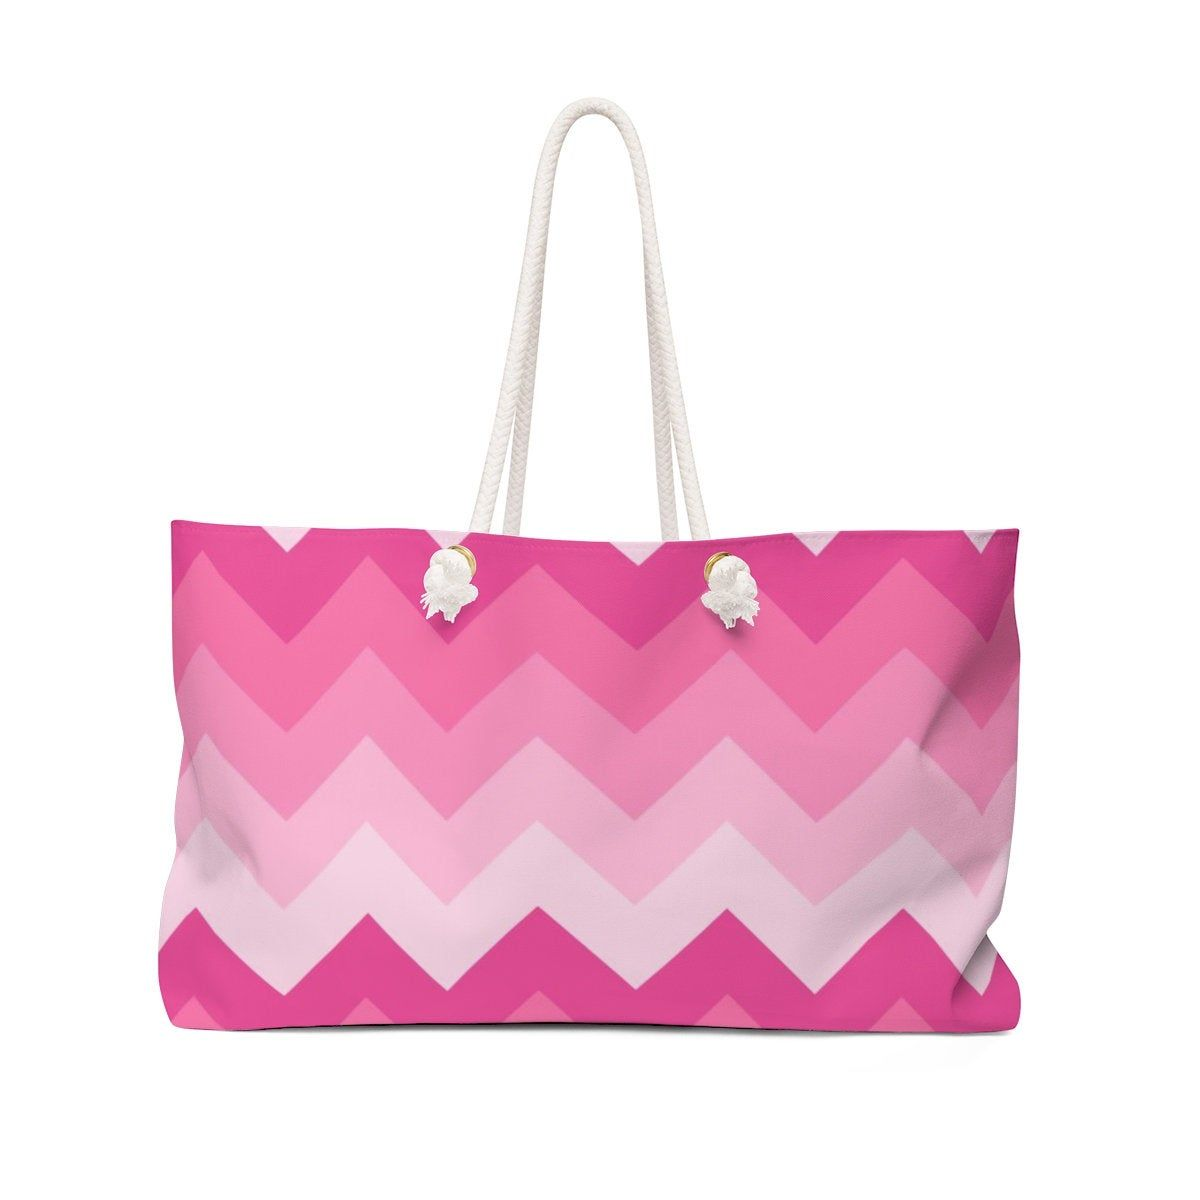 Womens Weekender Bag Hot Pink Chevron Ombre Fade Tote Girls Beach